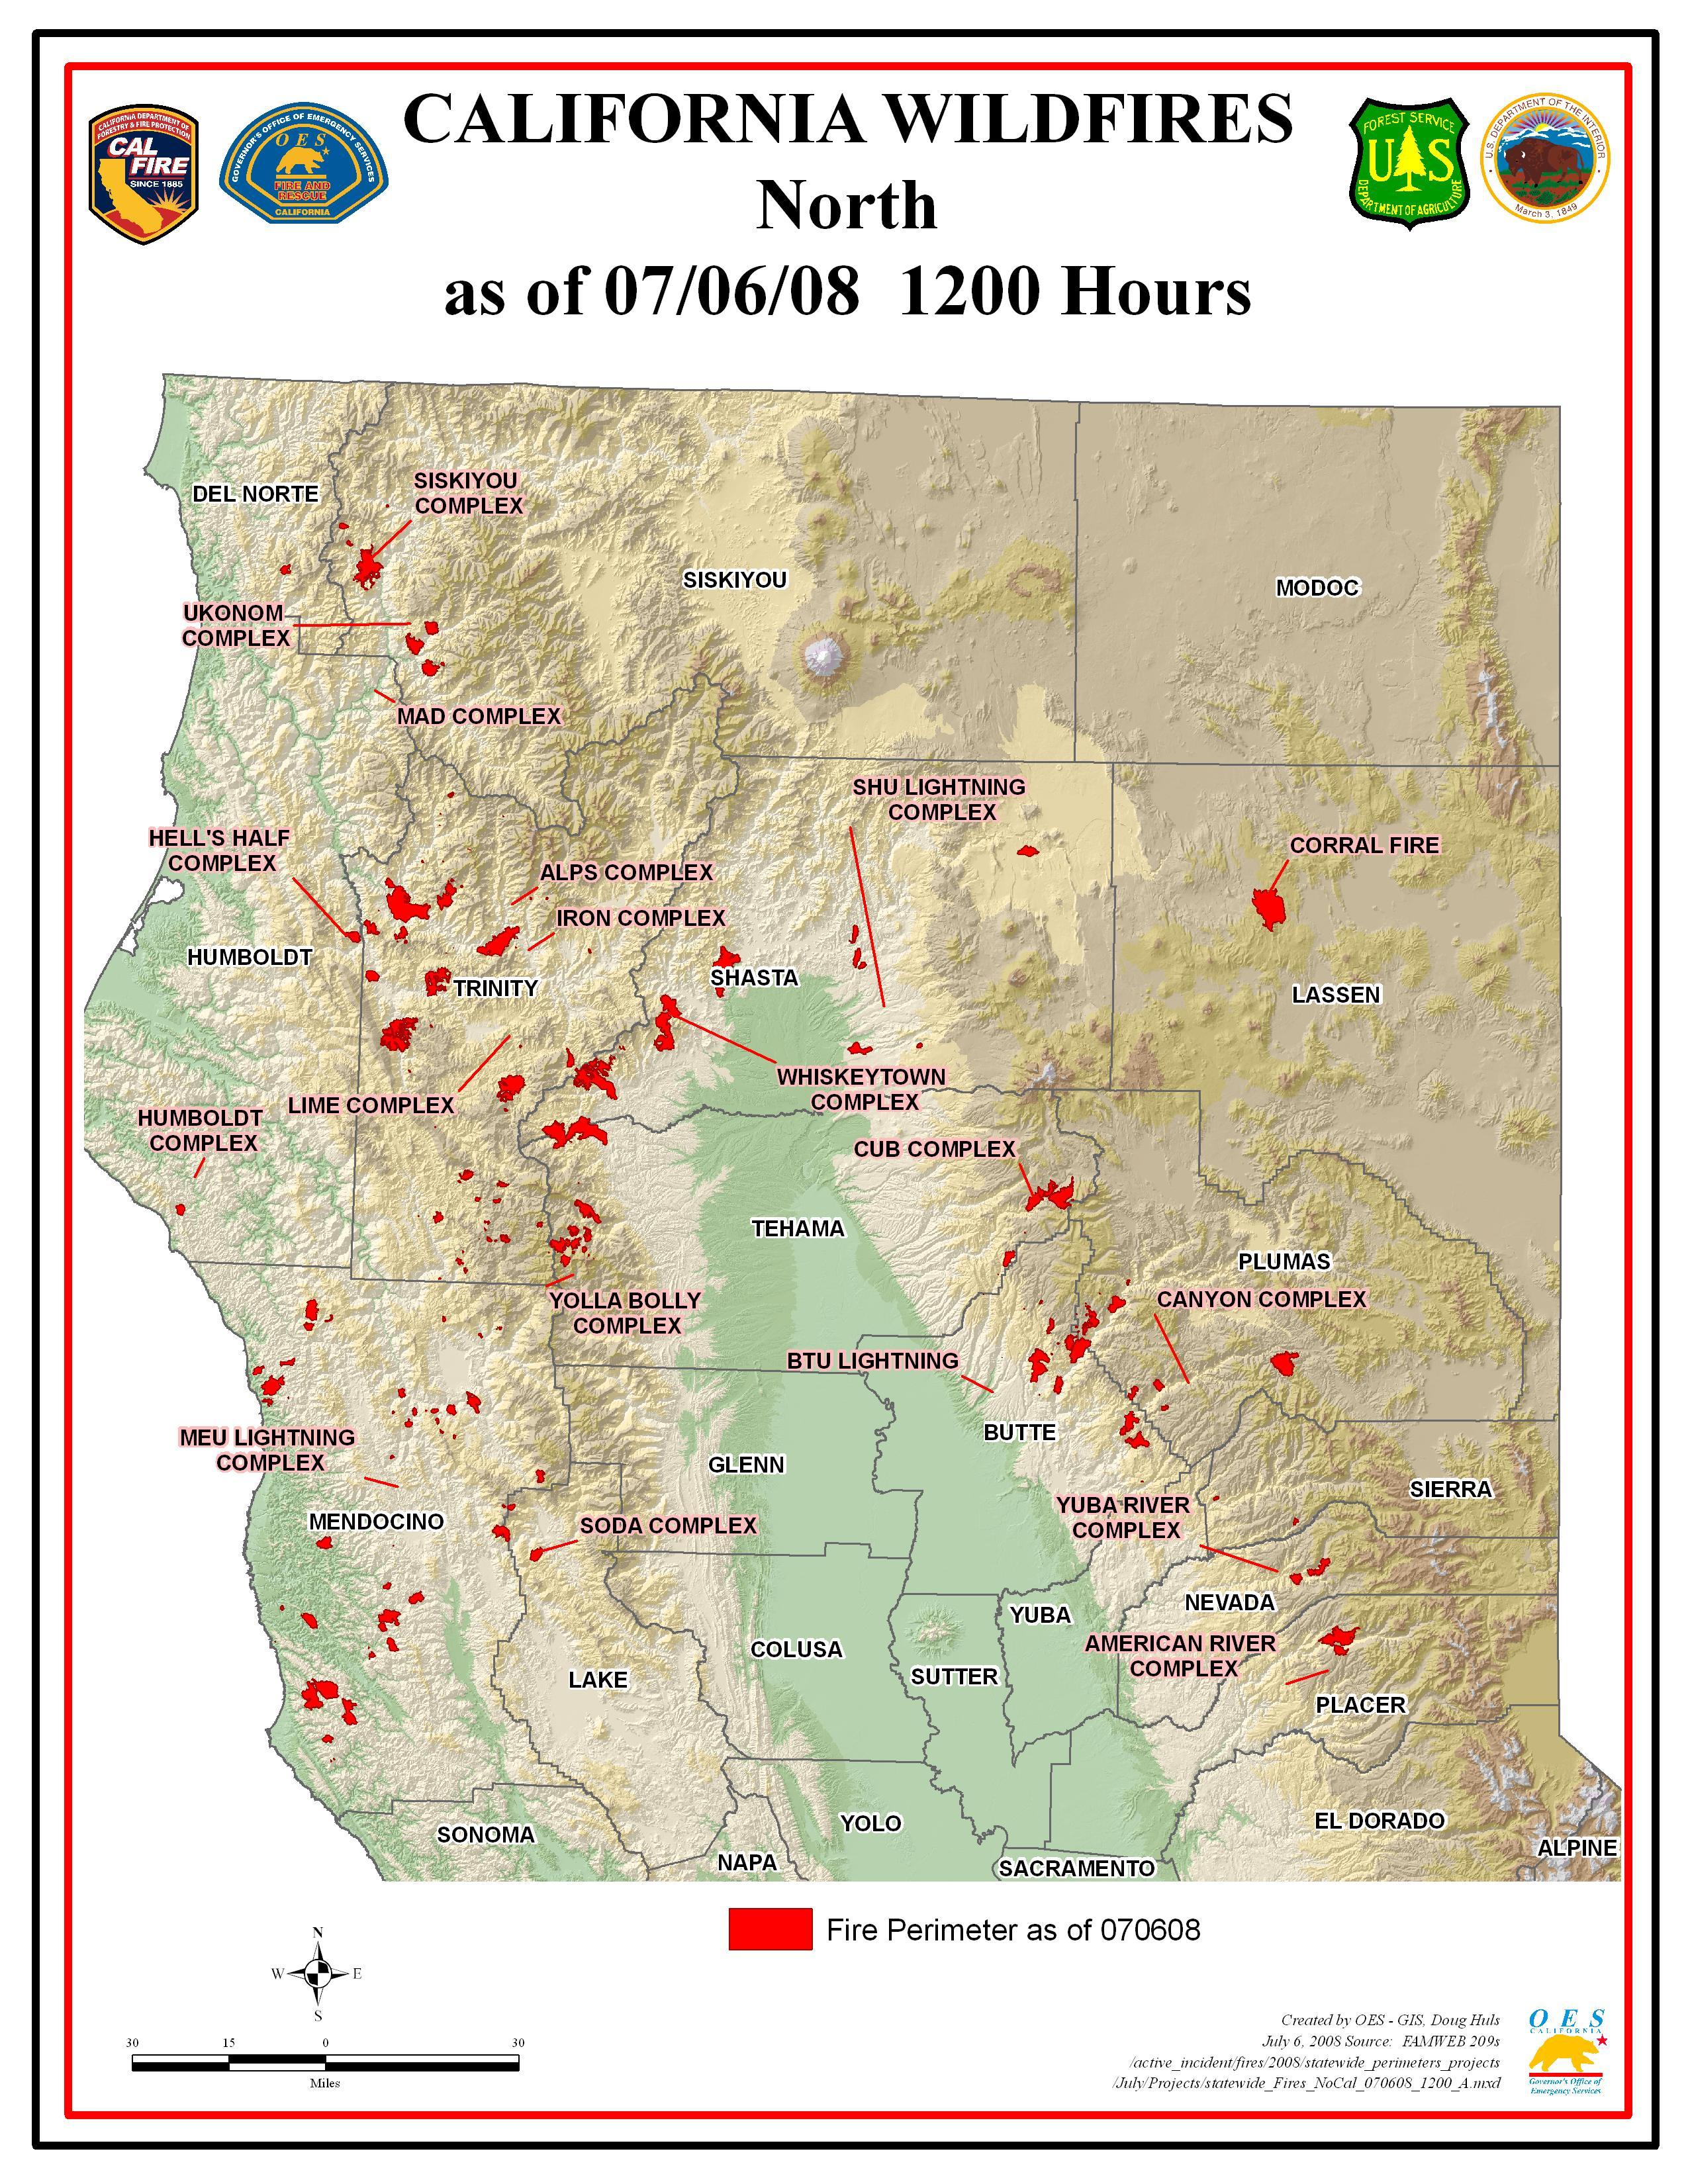 Current California Fire Map - Klipy - San Diego California Fire Map